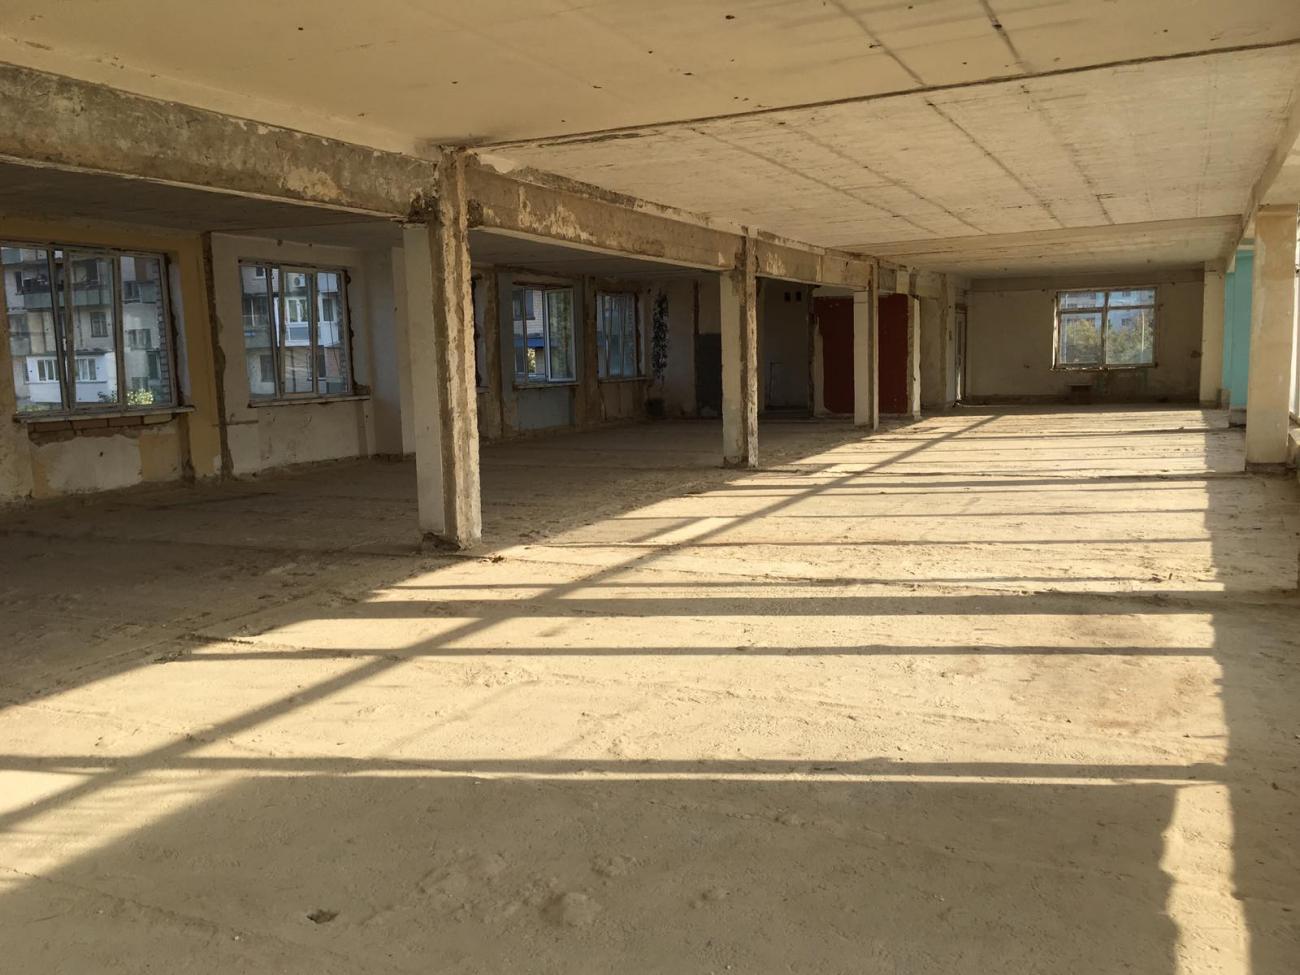 Ручной демонтаж зданий и сооружений (6)